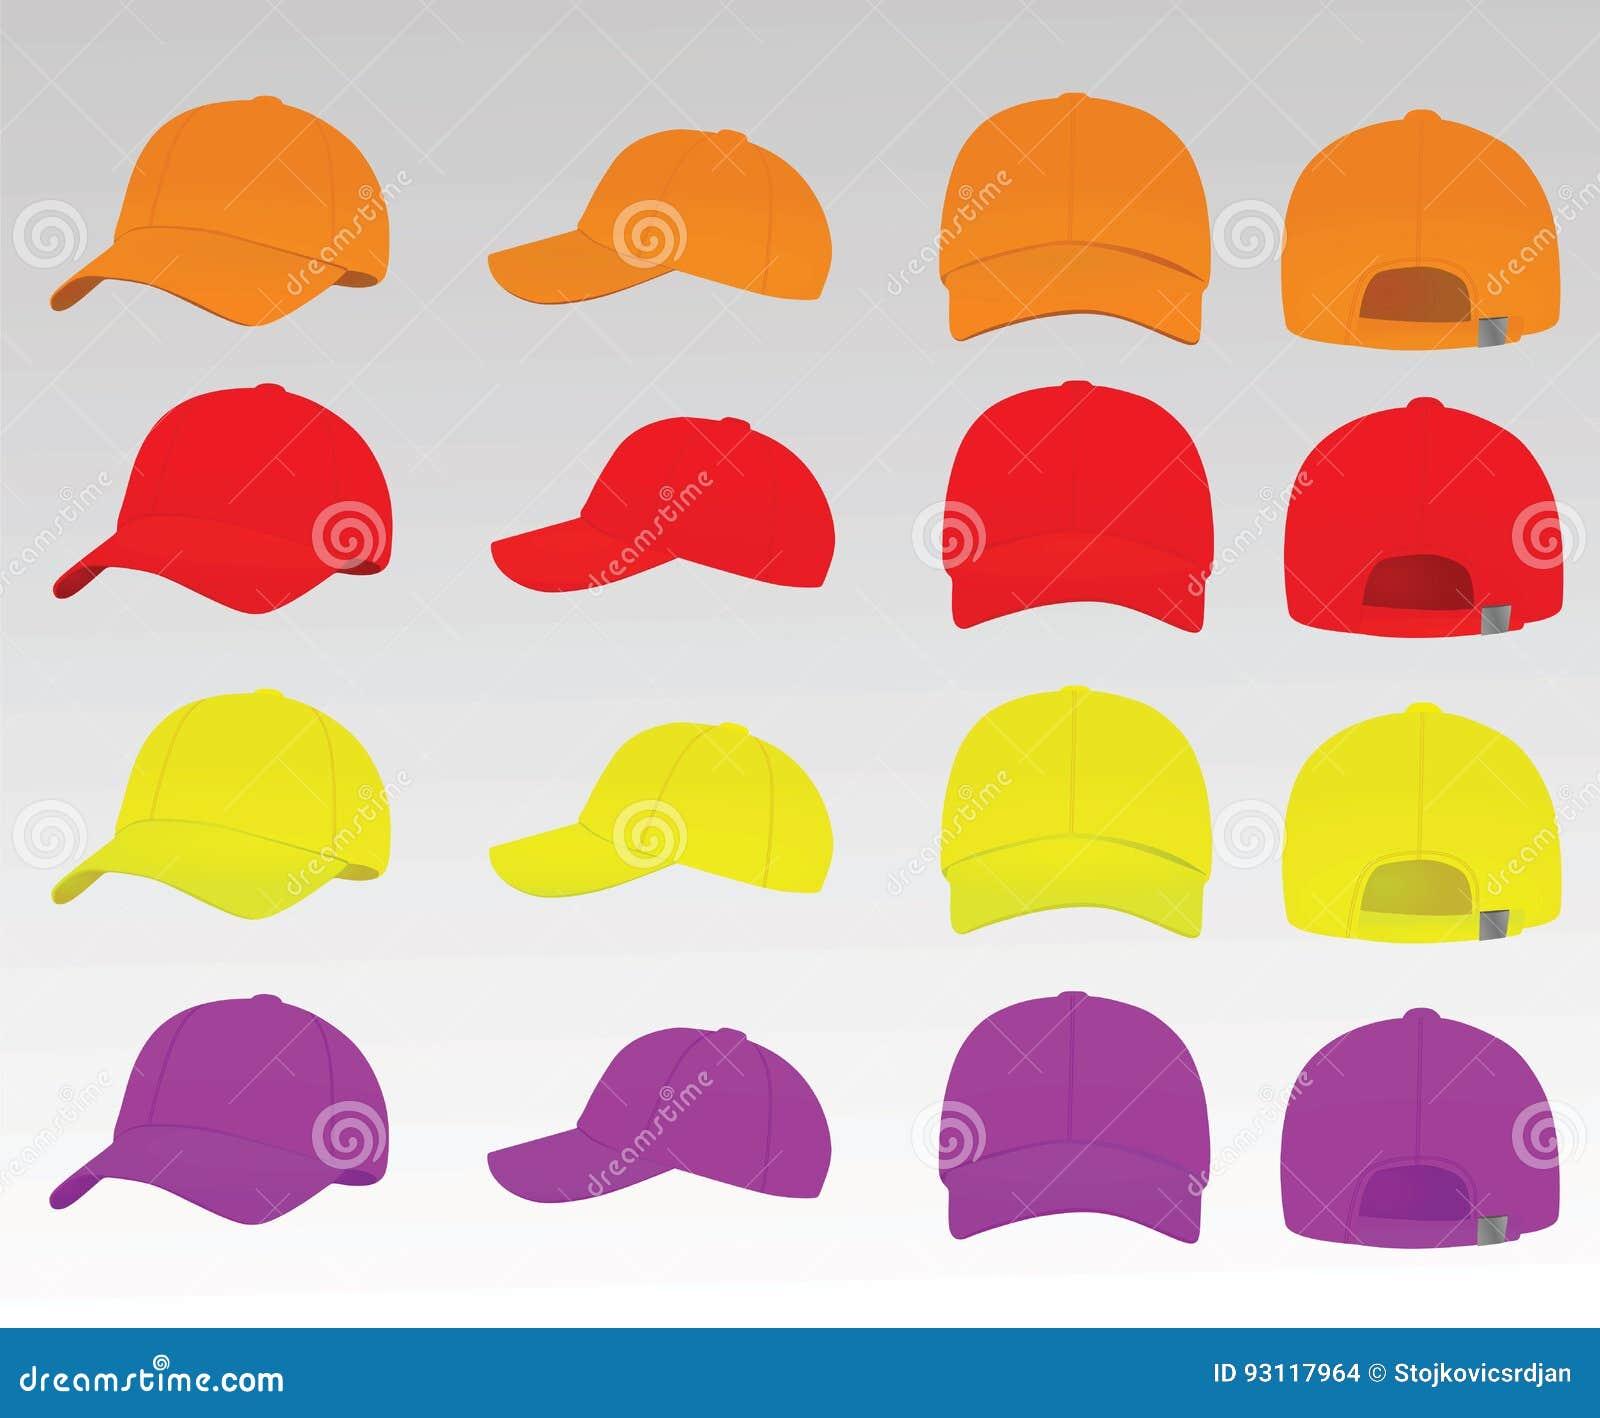 c79eb63a Baseball caps stock vector. Illustration of head, light - 93117964